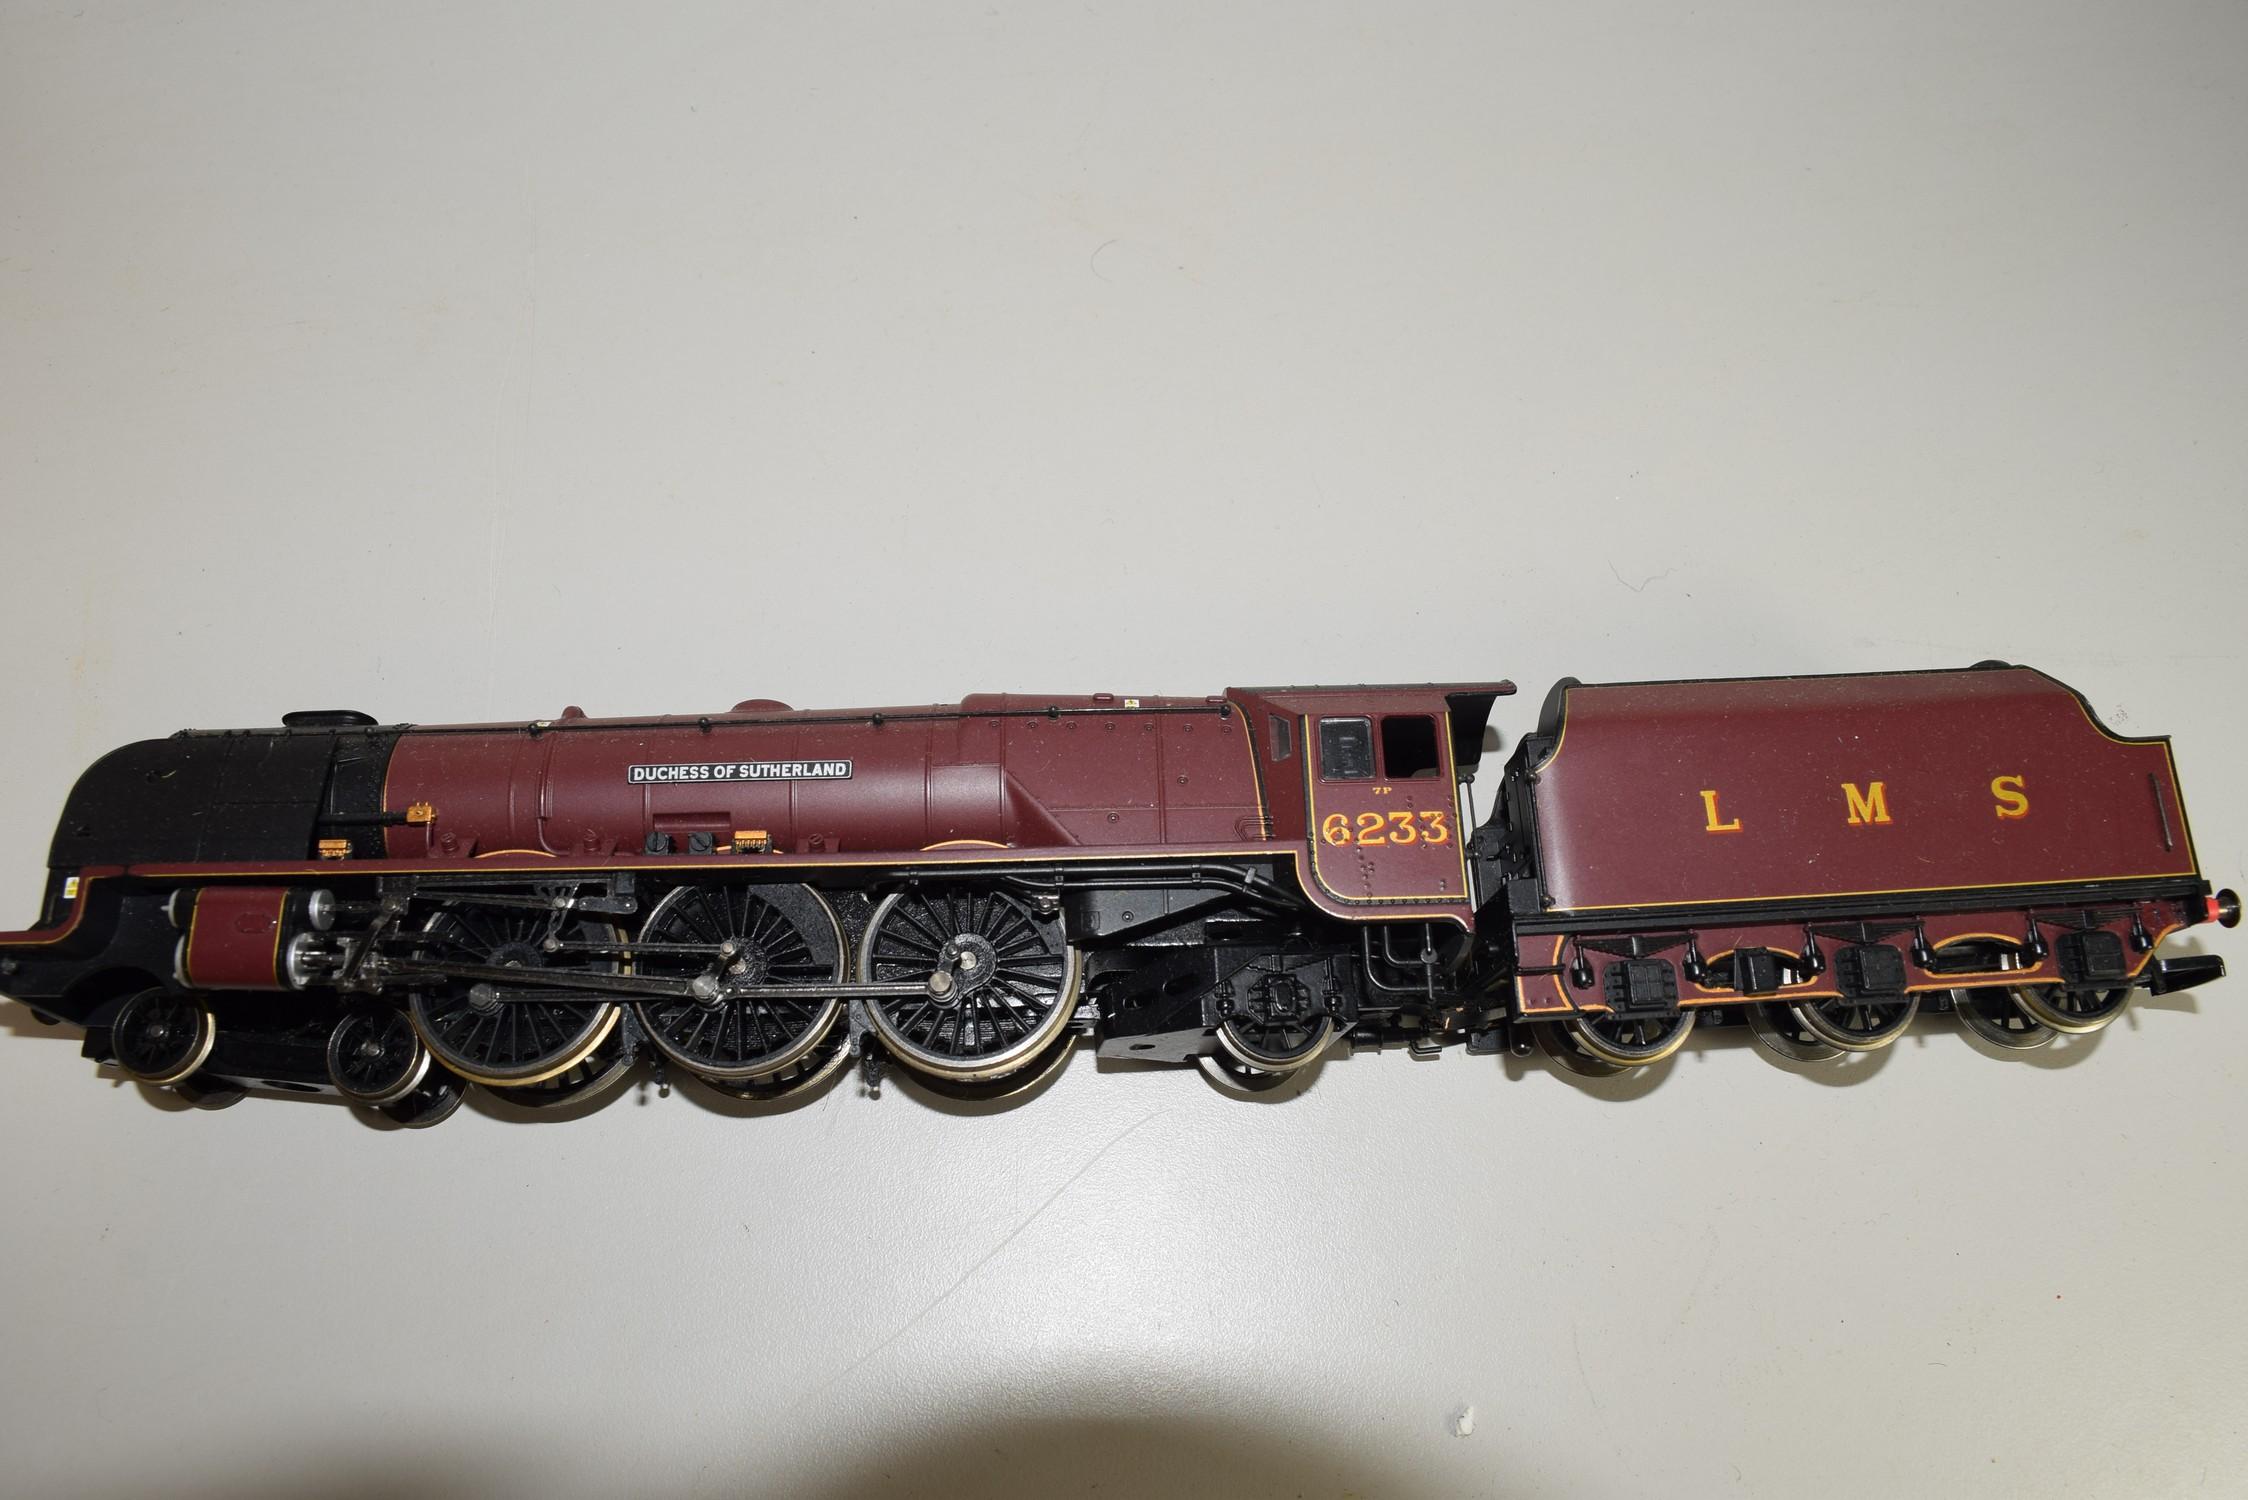 "Unboxed Hornby 00 gauge ""Ducheess of Sutherland"" locomotive no 6233"